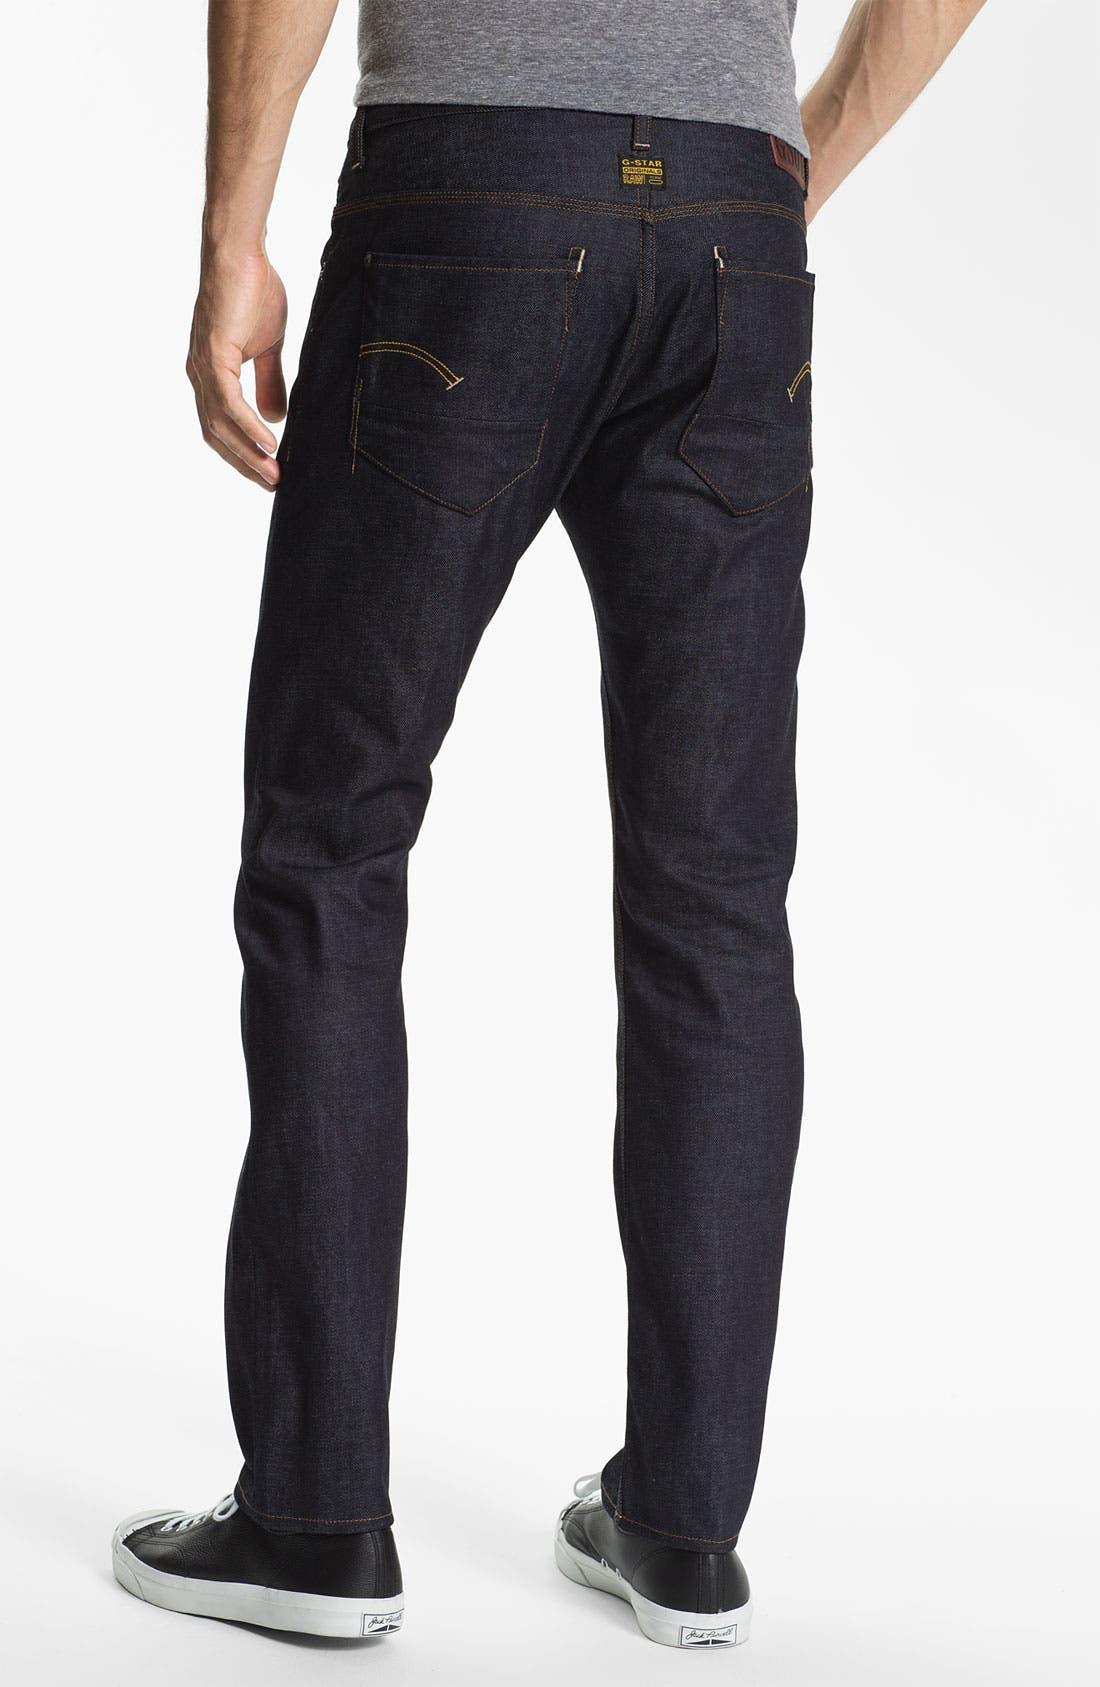 Alternate Image 1 Selected - G-Star Raw 'New Radar' Slim Straight Leg Jeans (Rigid Raw)